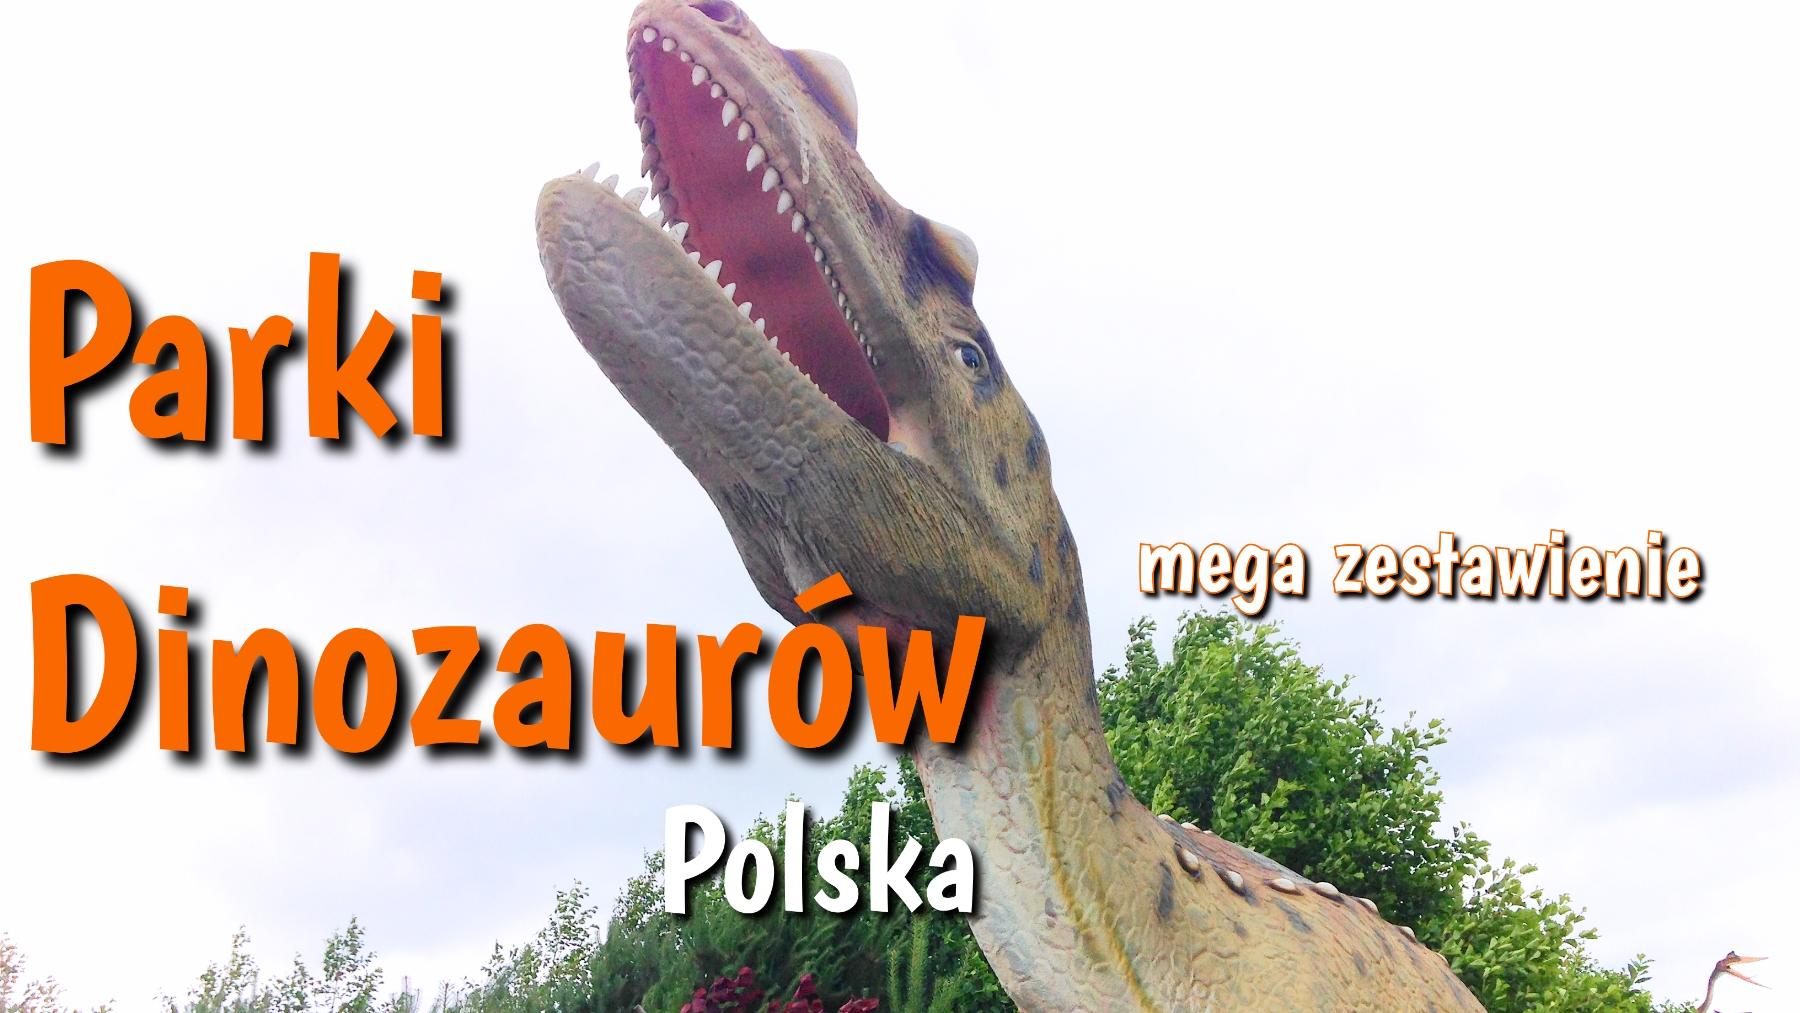 Parki Dinozaurów